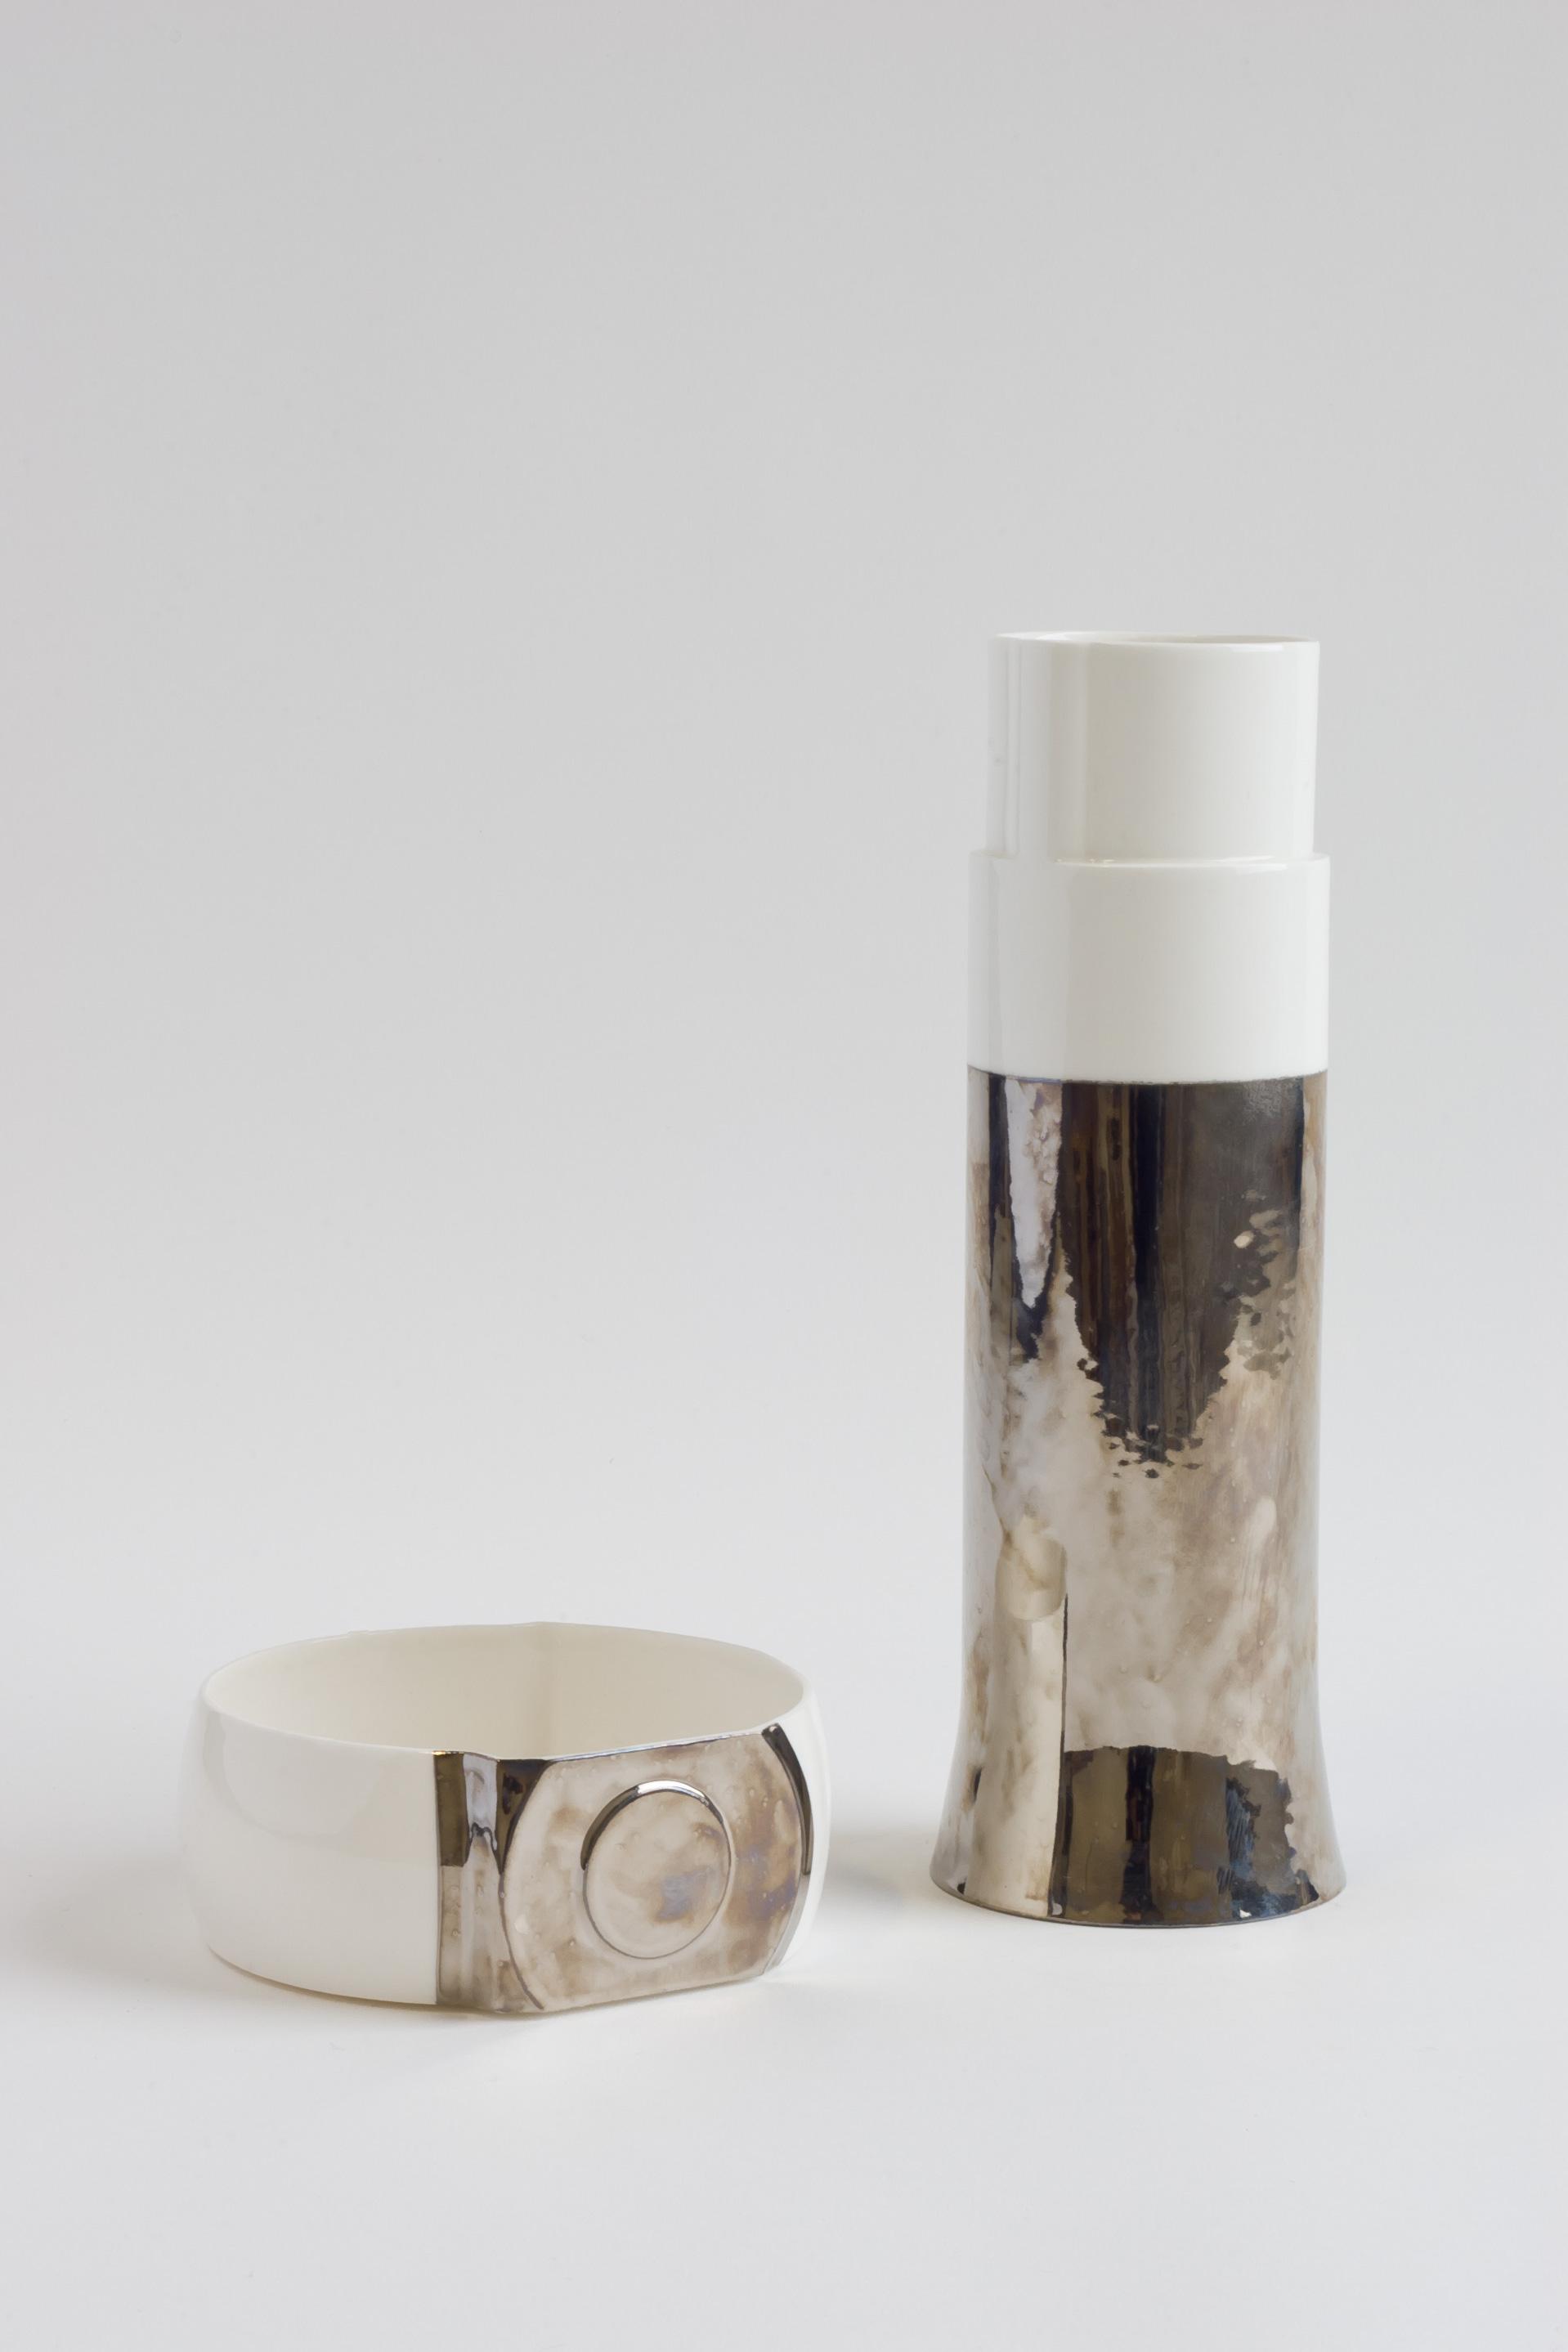 a4_minalemaeda_manufactured_ceramics_mdby_mdba_cadcam_tableware_06_silverluster